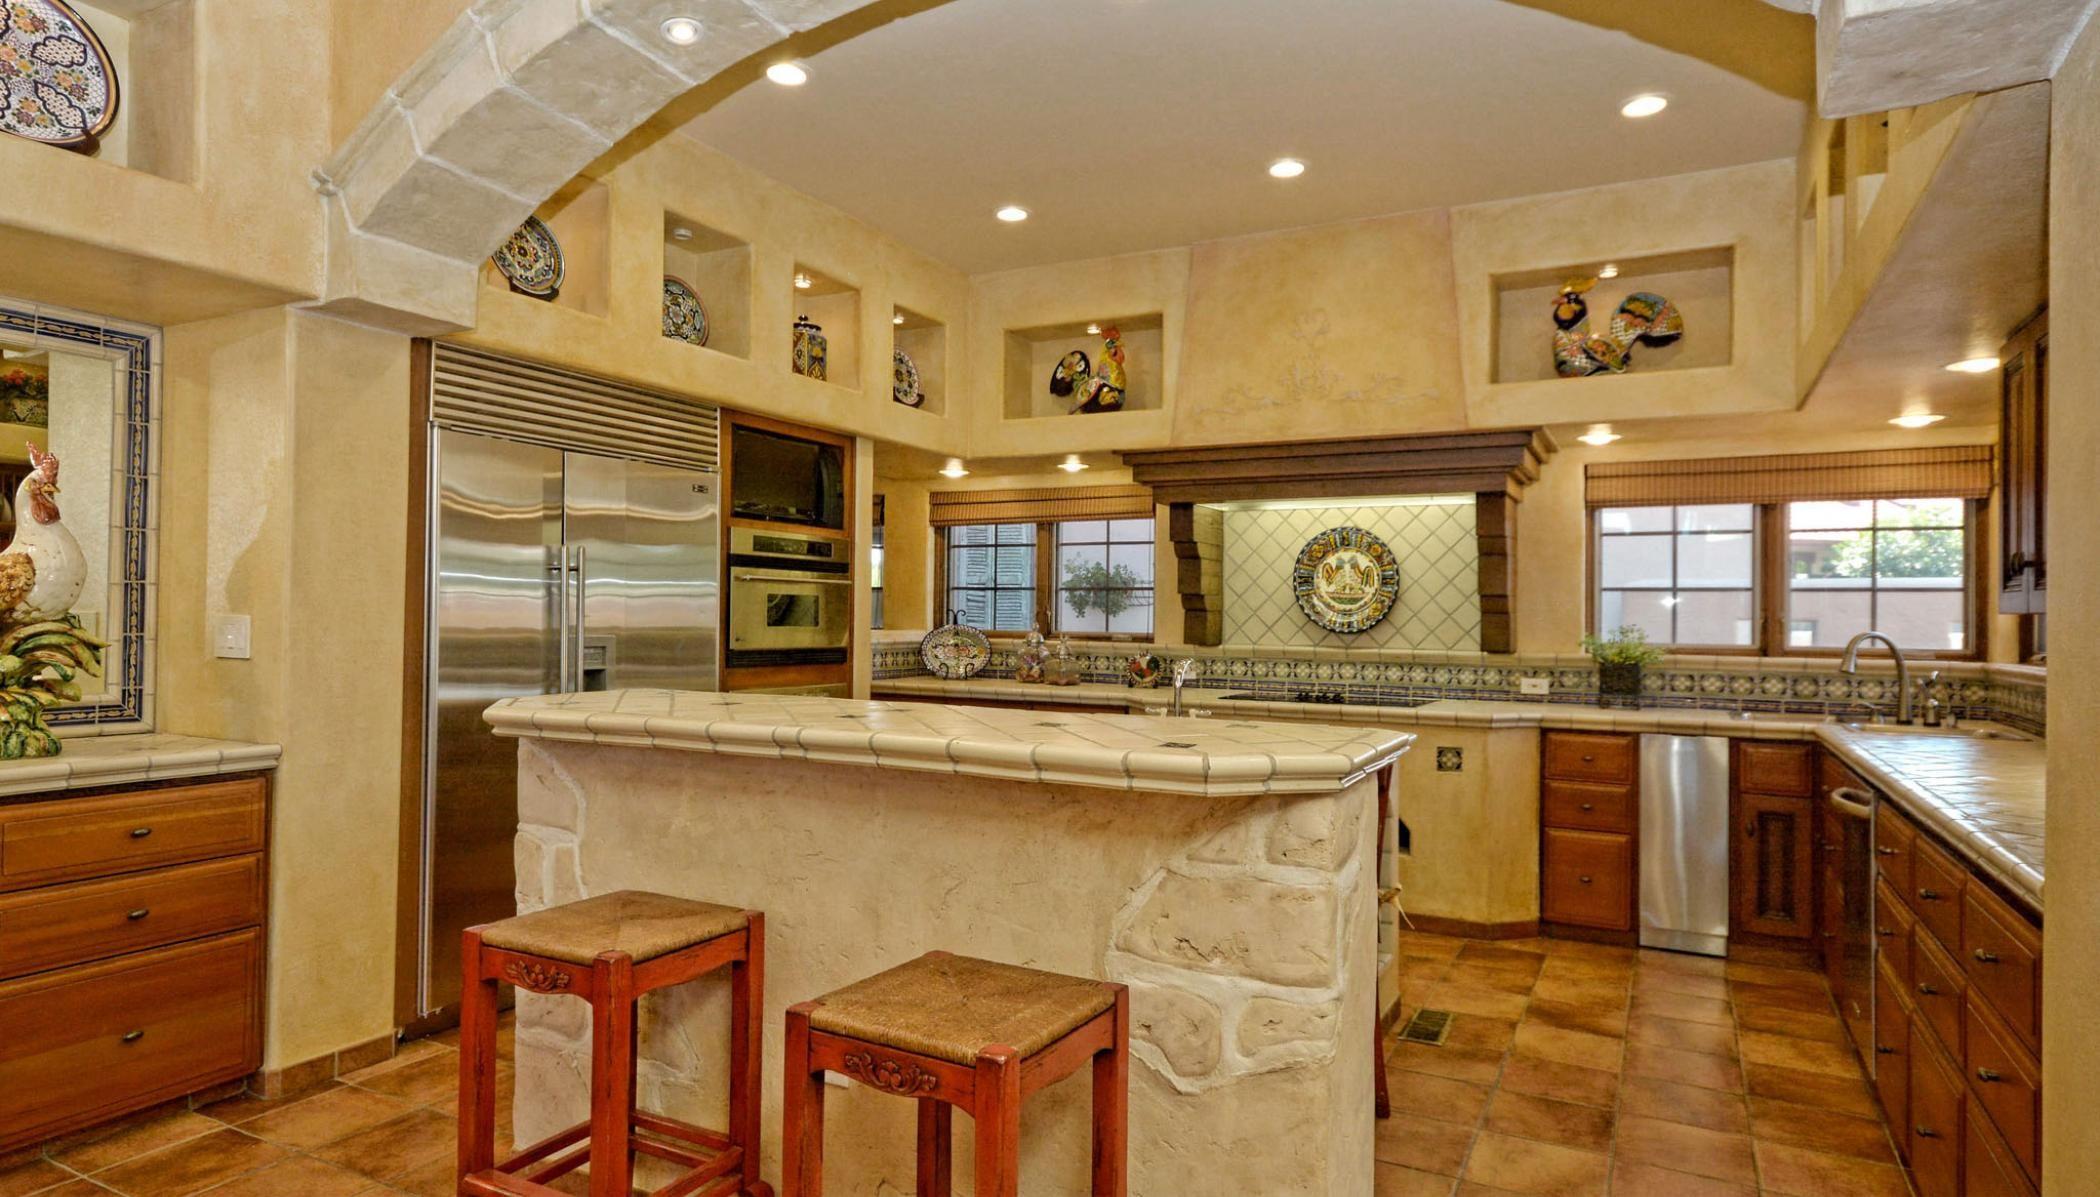 interior design interior design elements hill country on modern kitchen design that will inspire your luxury interior essential elements id=85180